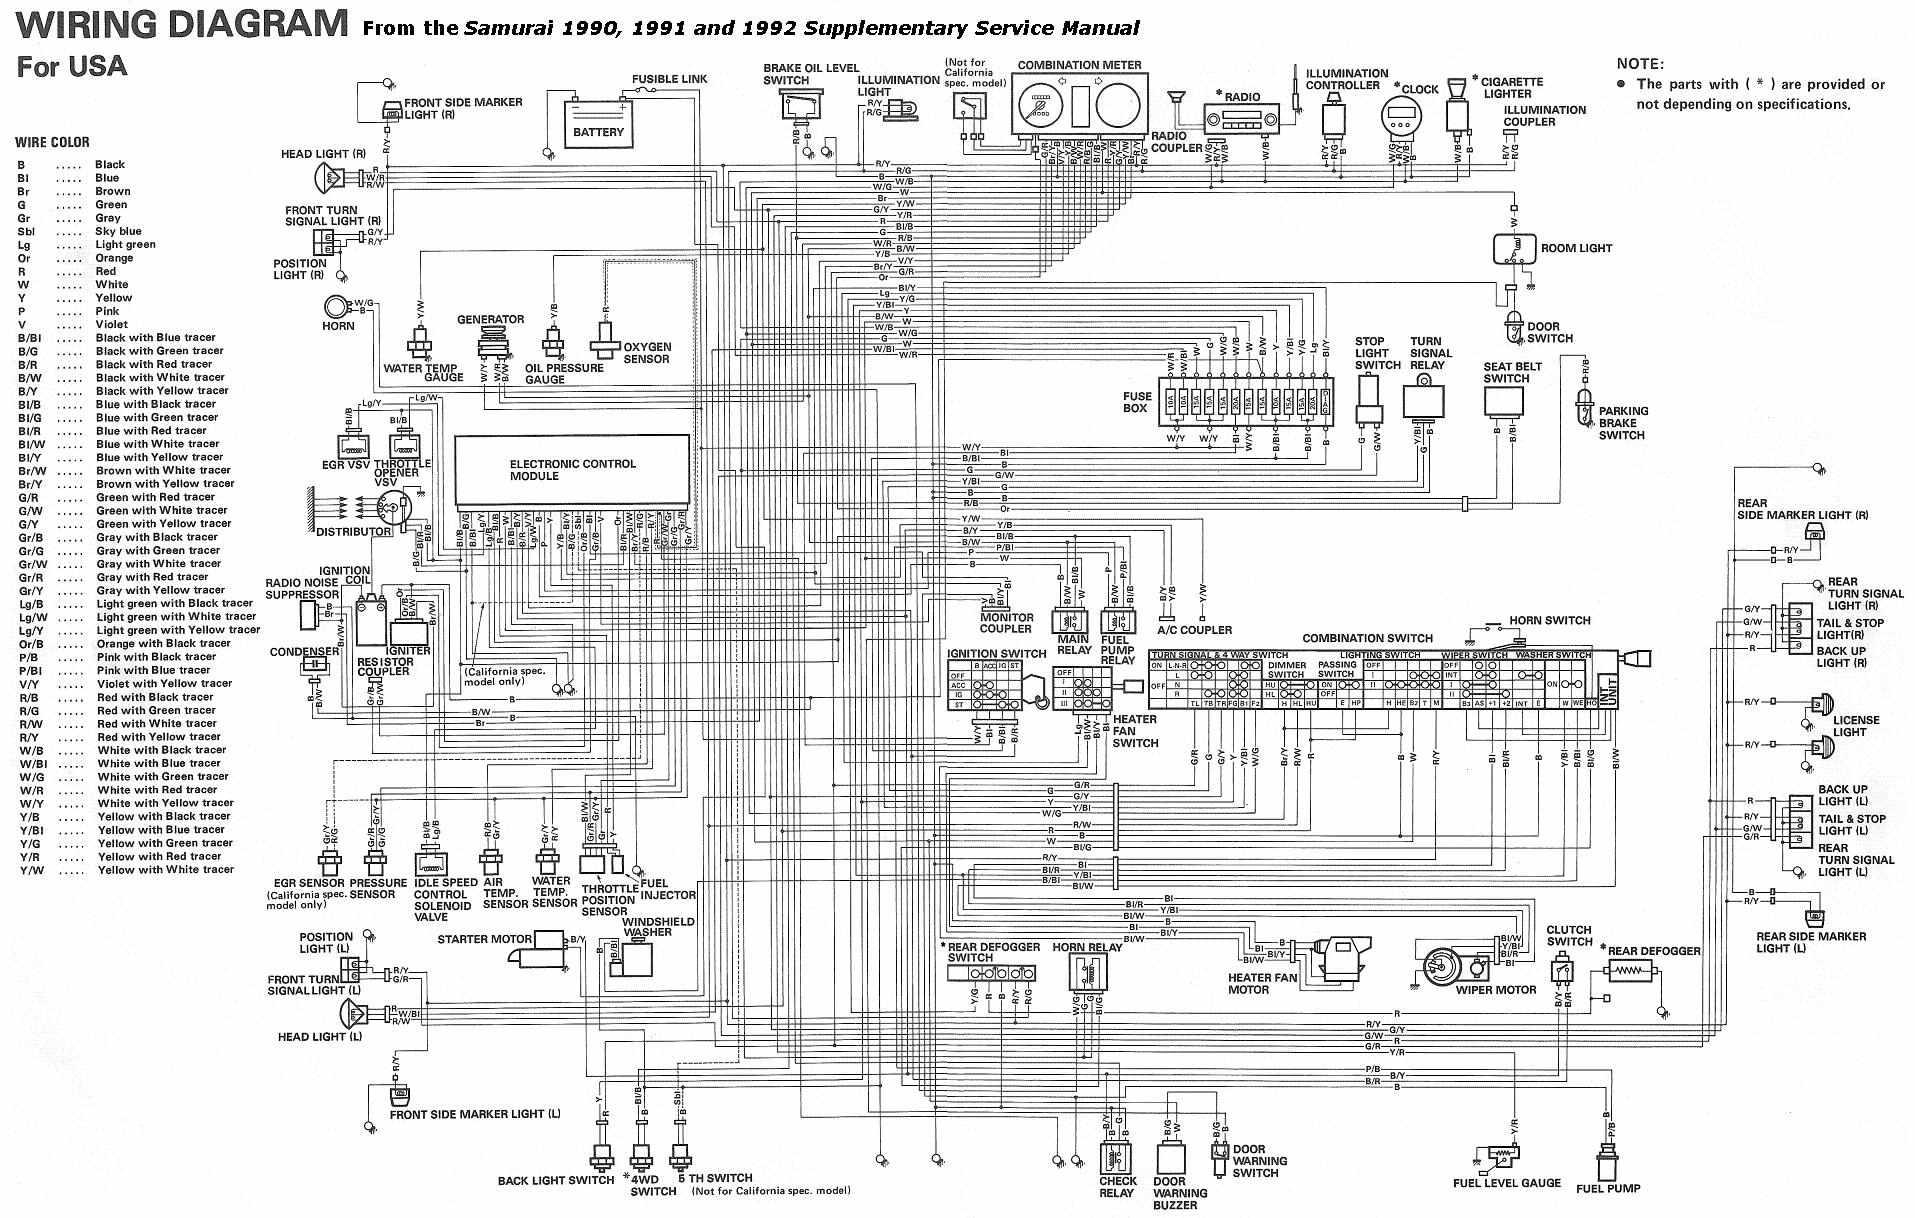 small resolution of 1995 yamaha wolverine wiring diagram archive of automotive wiring kawasaki prairie 700 wiring diagram 1995 yamaha